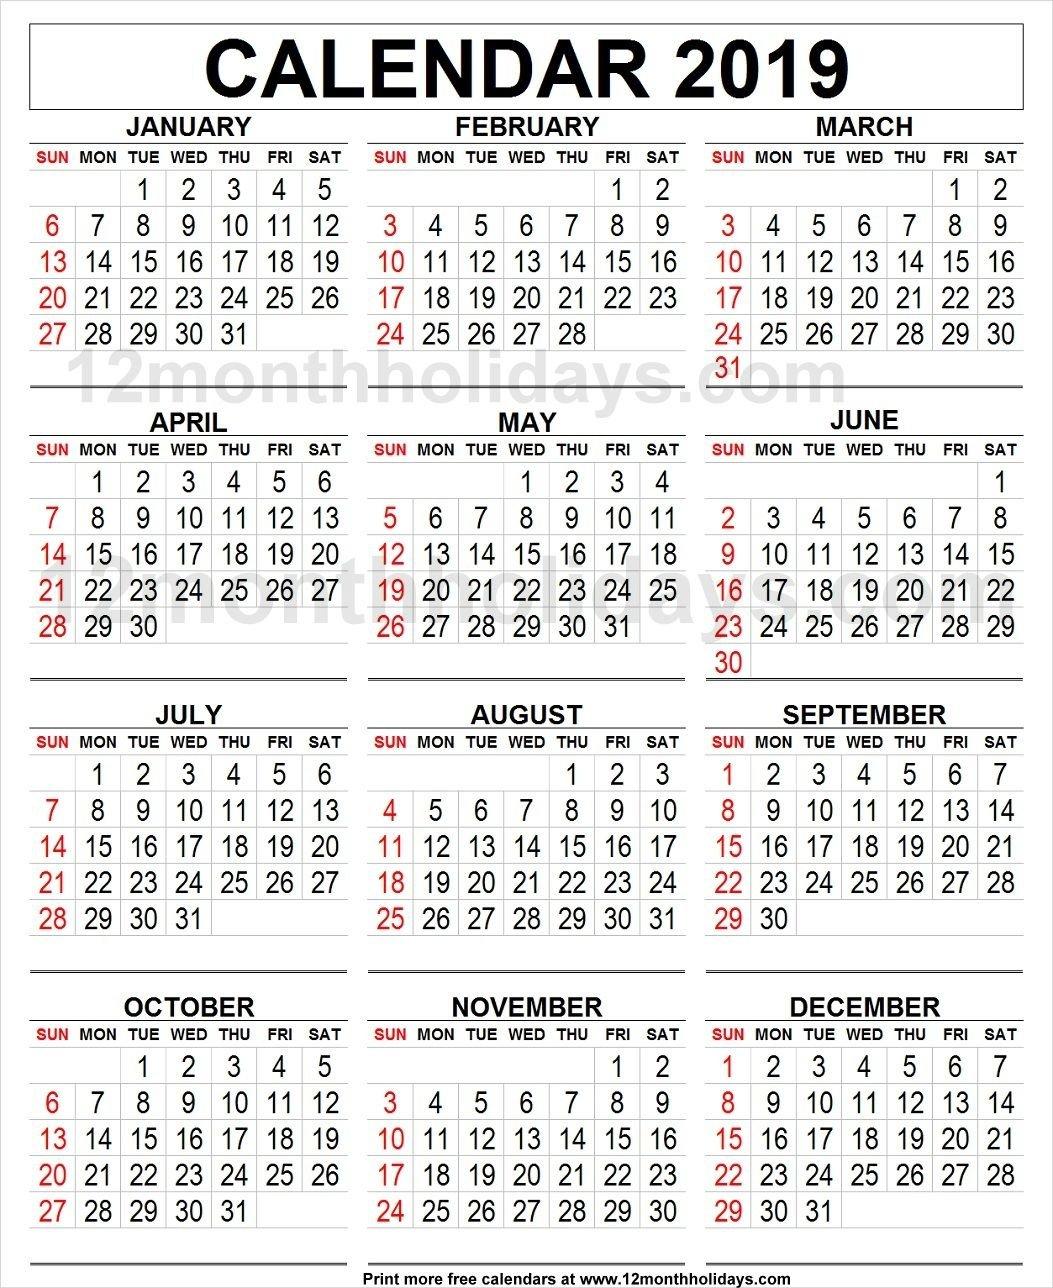 Calendar 2019 Large | 2019 Yearly Calendar | Printable Blank Calendar 2019 Large